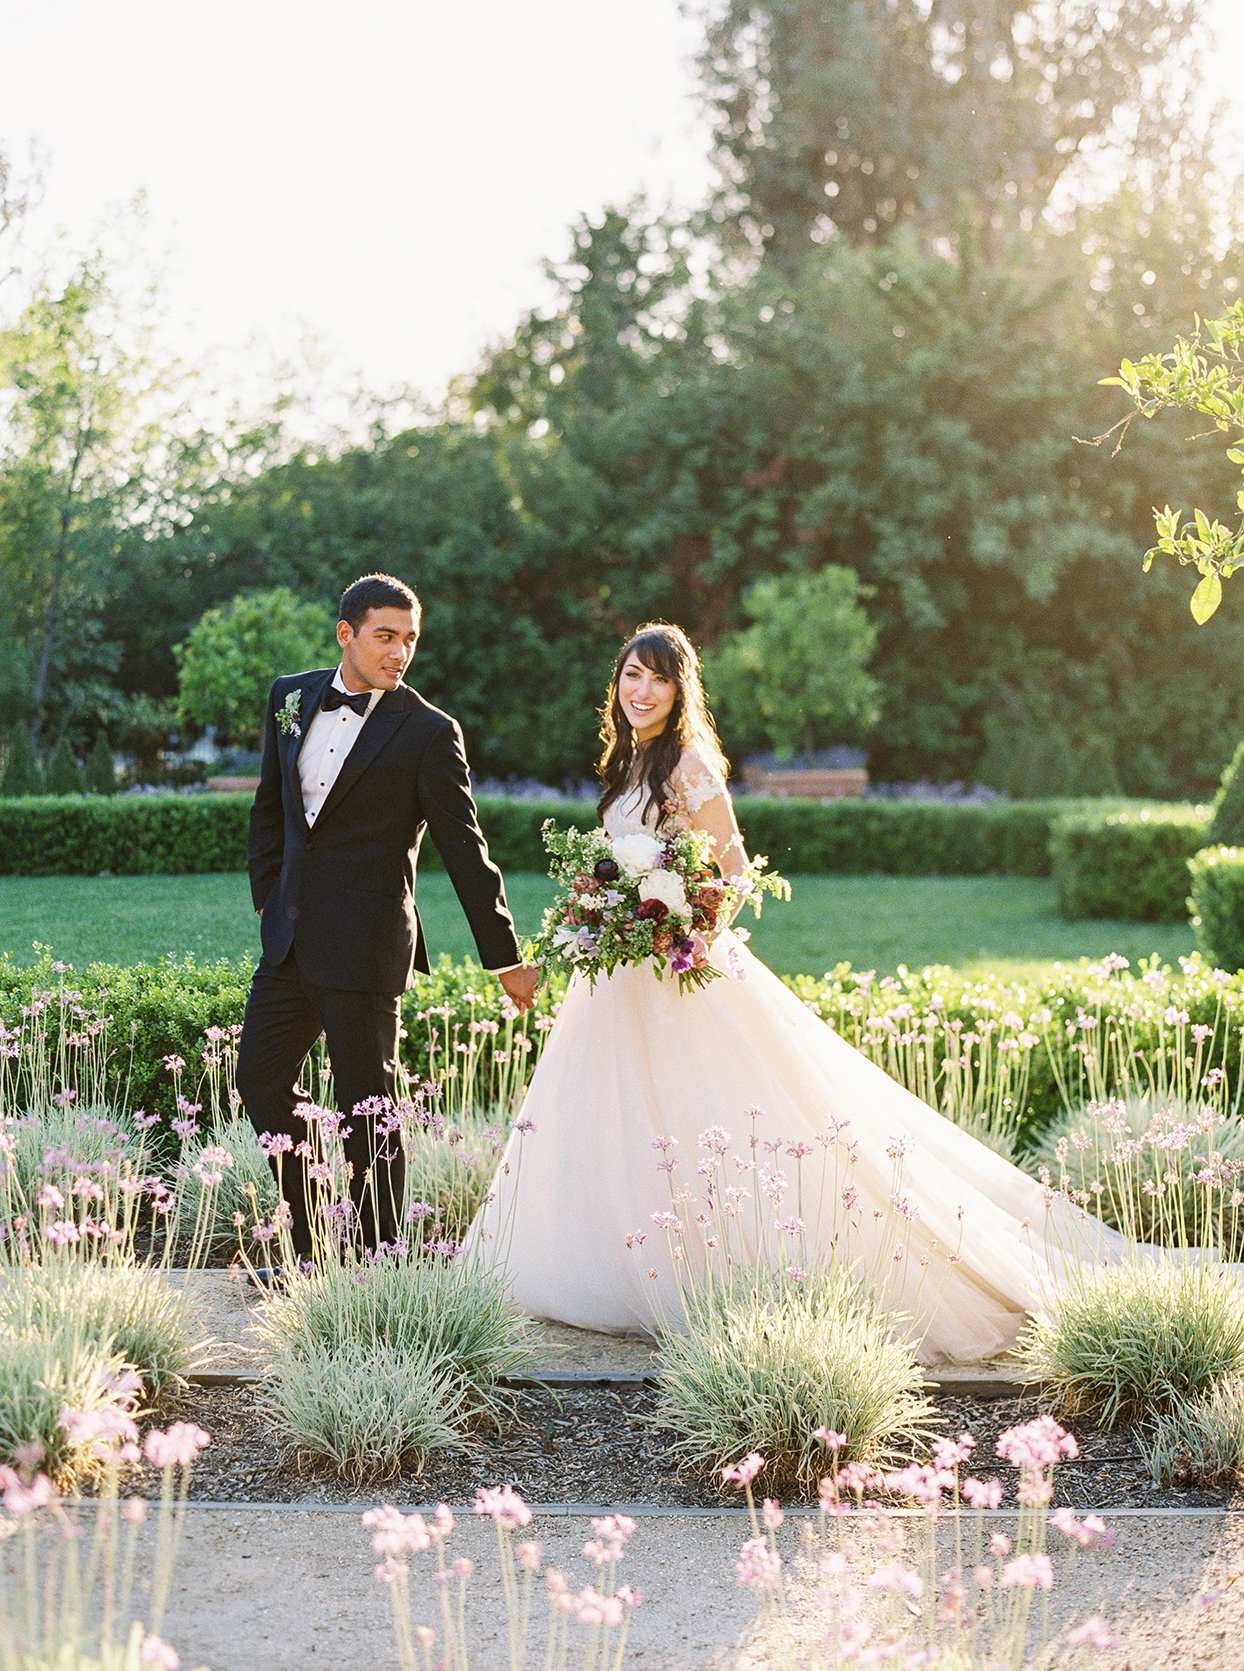 molly josh wedding couple walking in garden